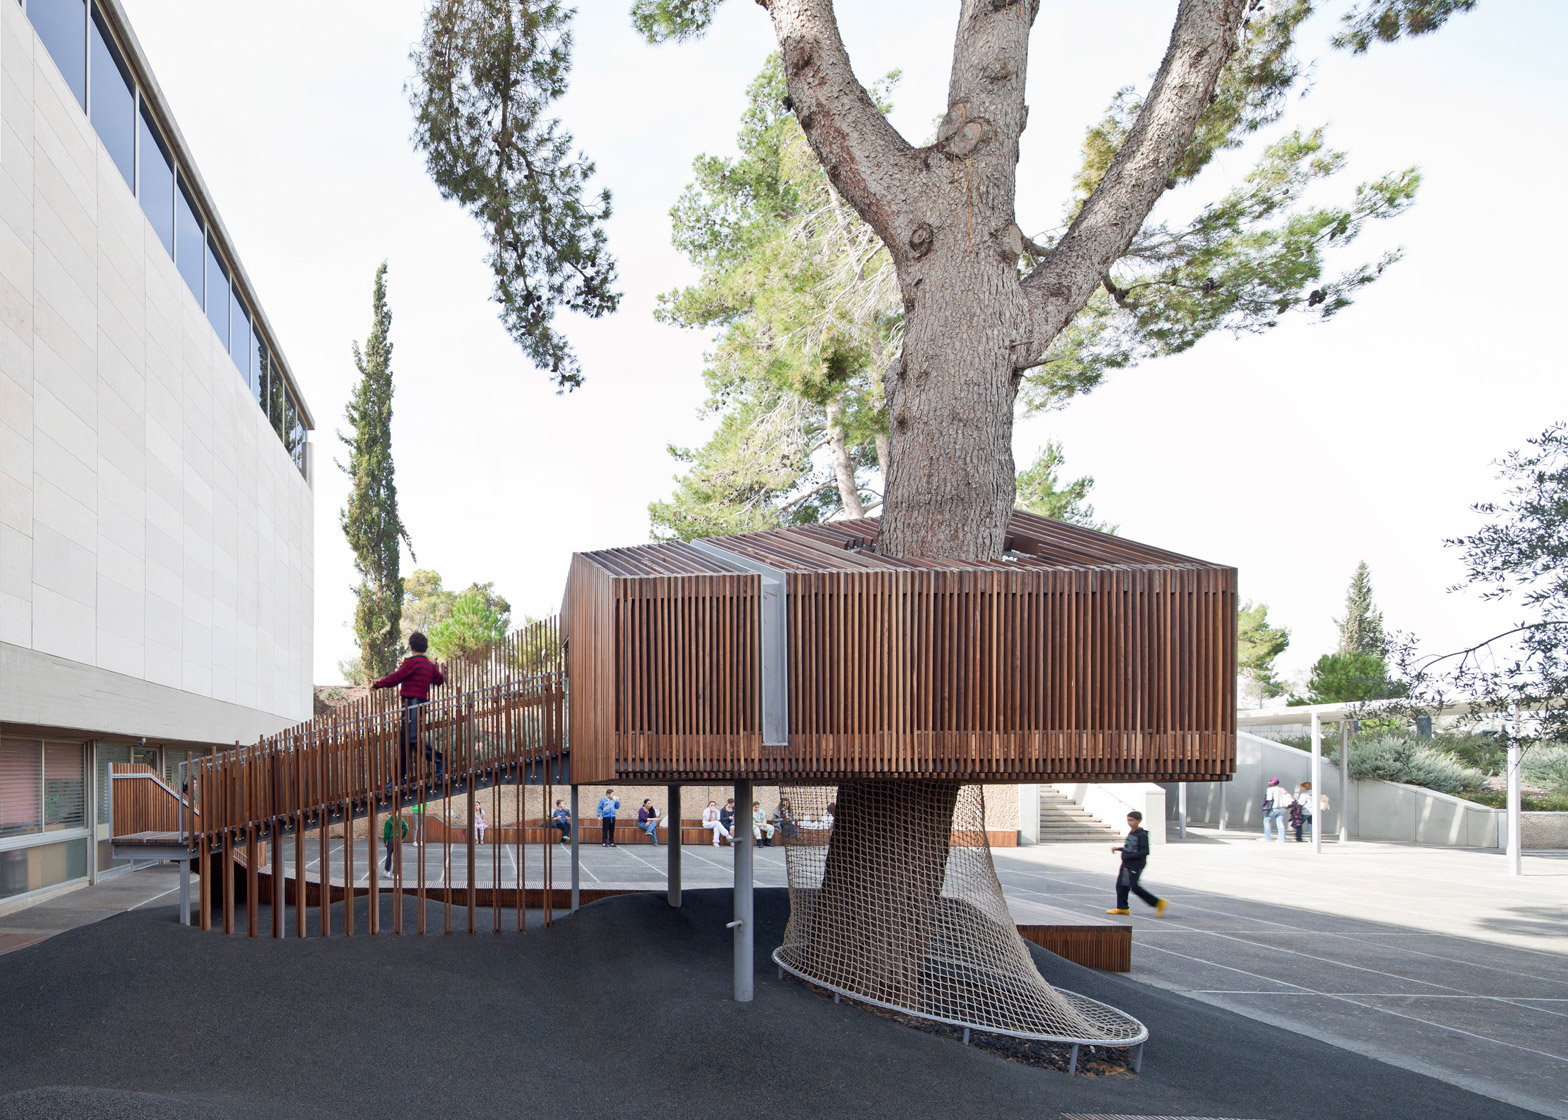 IMJ-tree-house-by-Ifat-Finkelman-and-Deborah-Warschawski_dezeen_1568_6.jpg